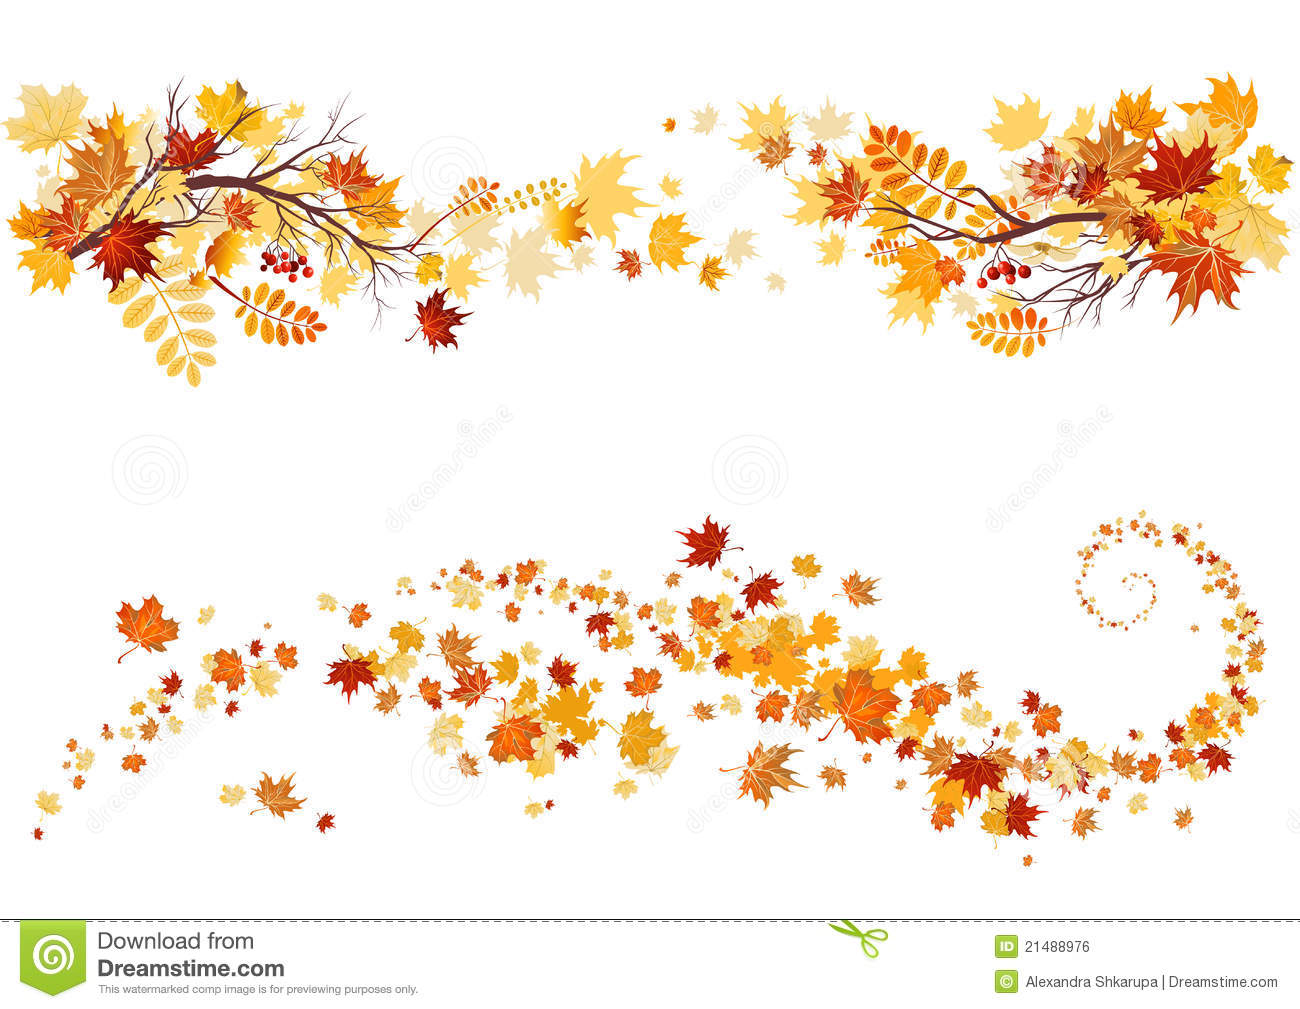 Autumn leaves clipart border